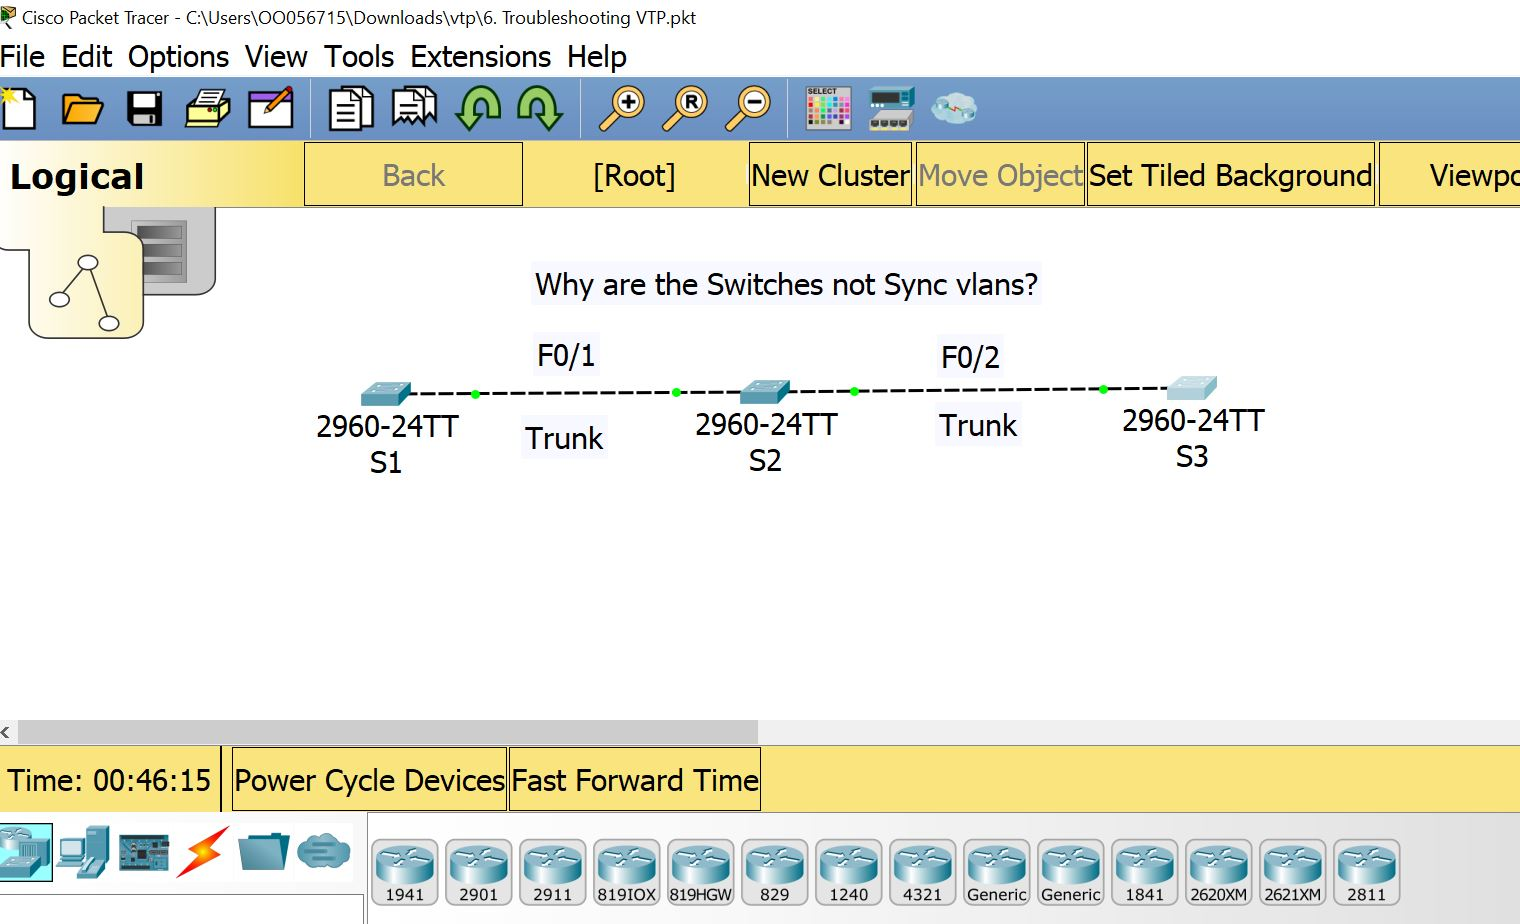 Troubleshooting VLAN Trunk Protocol in Server Mode (VTP)